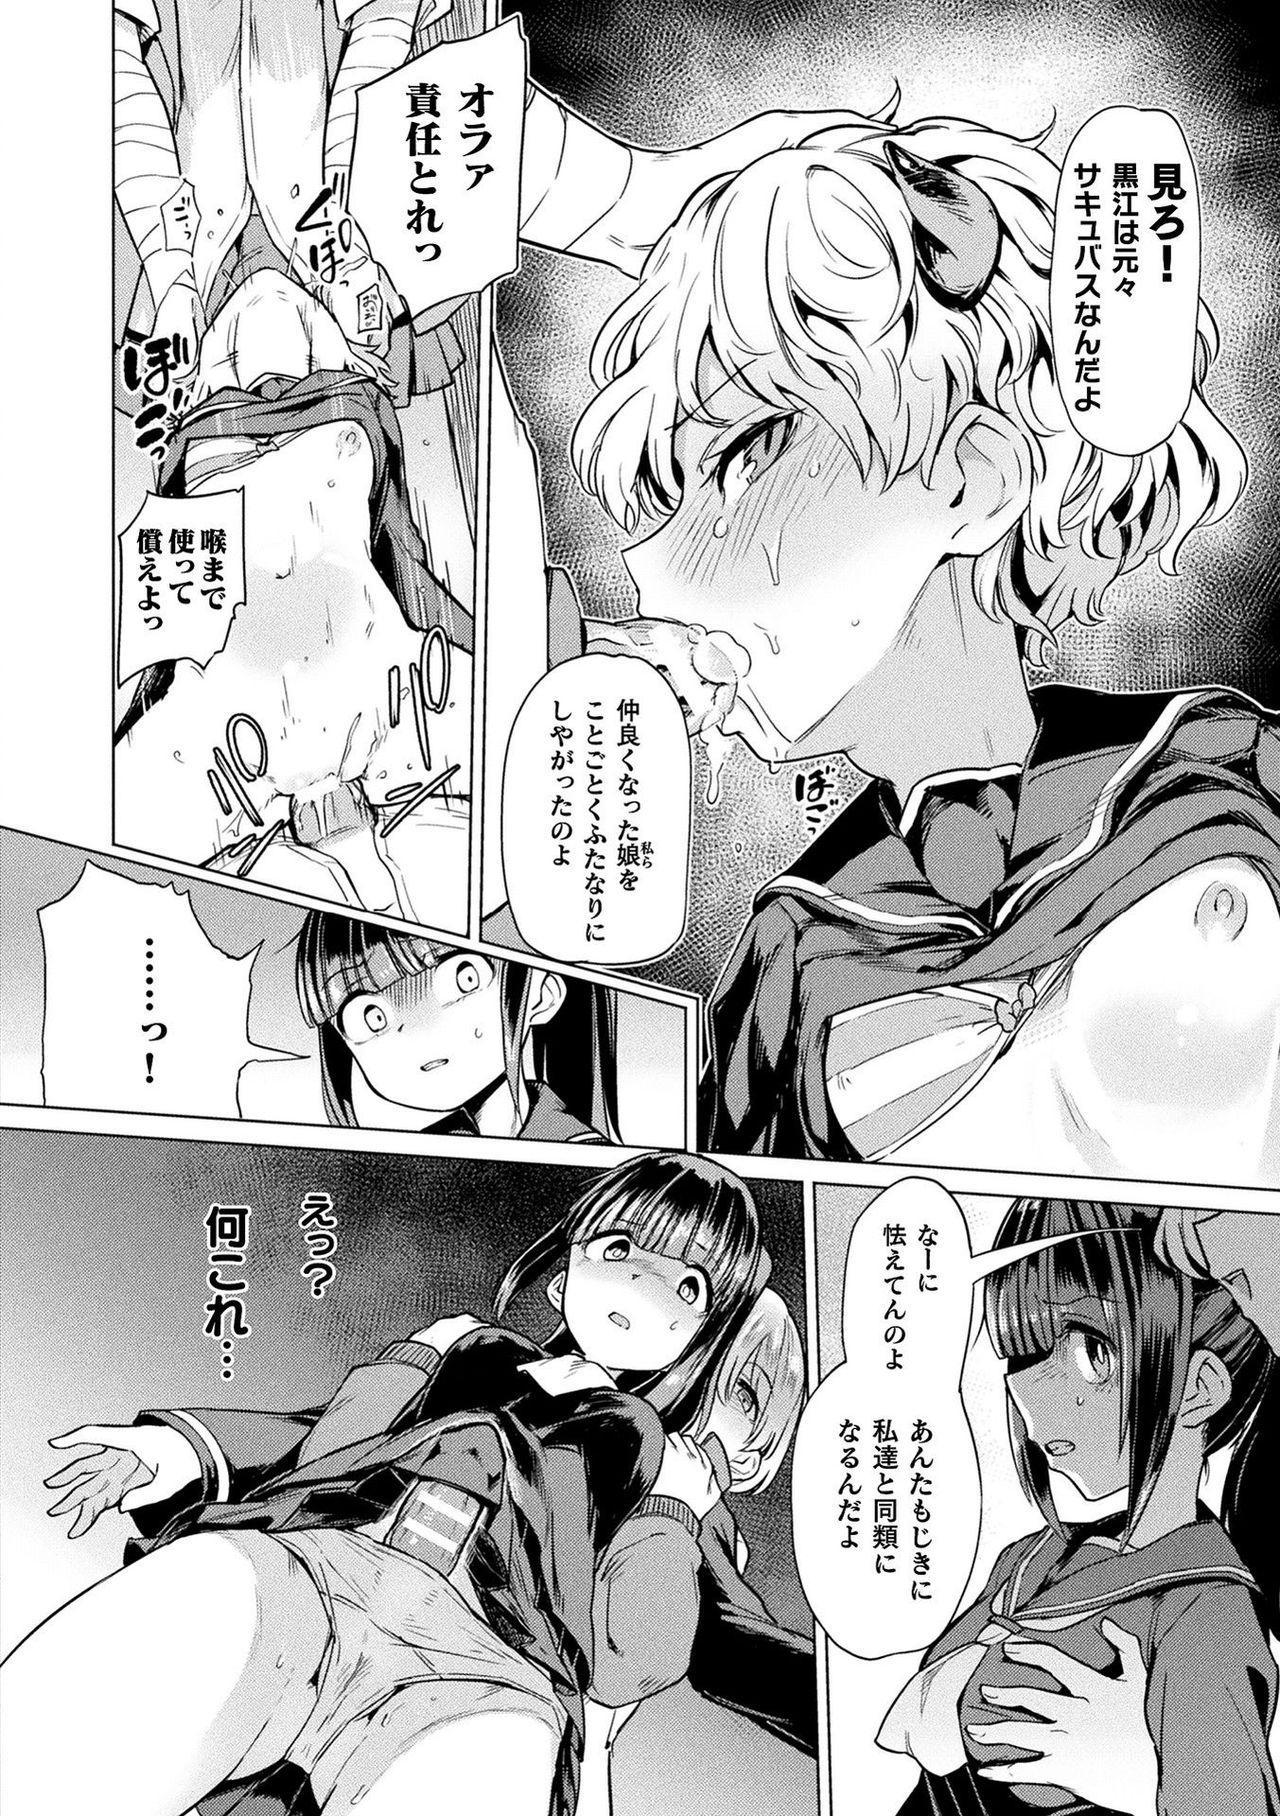 Comic Unreal The Best Futanari Collection 135